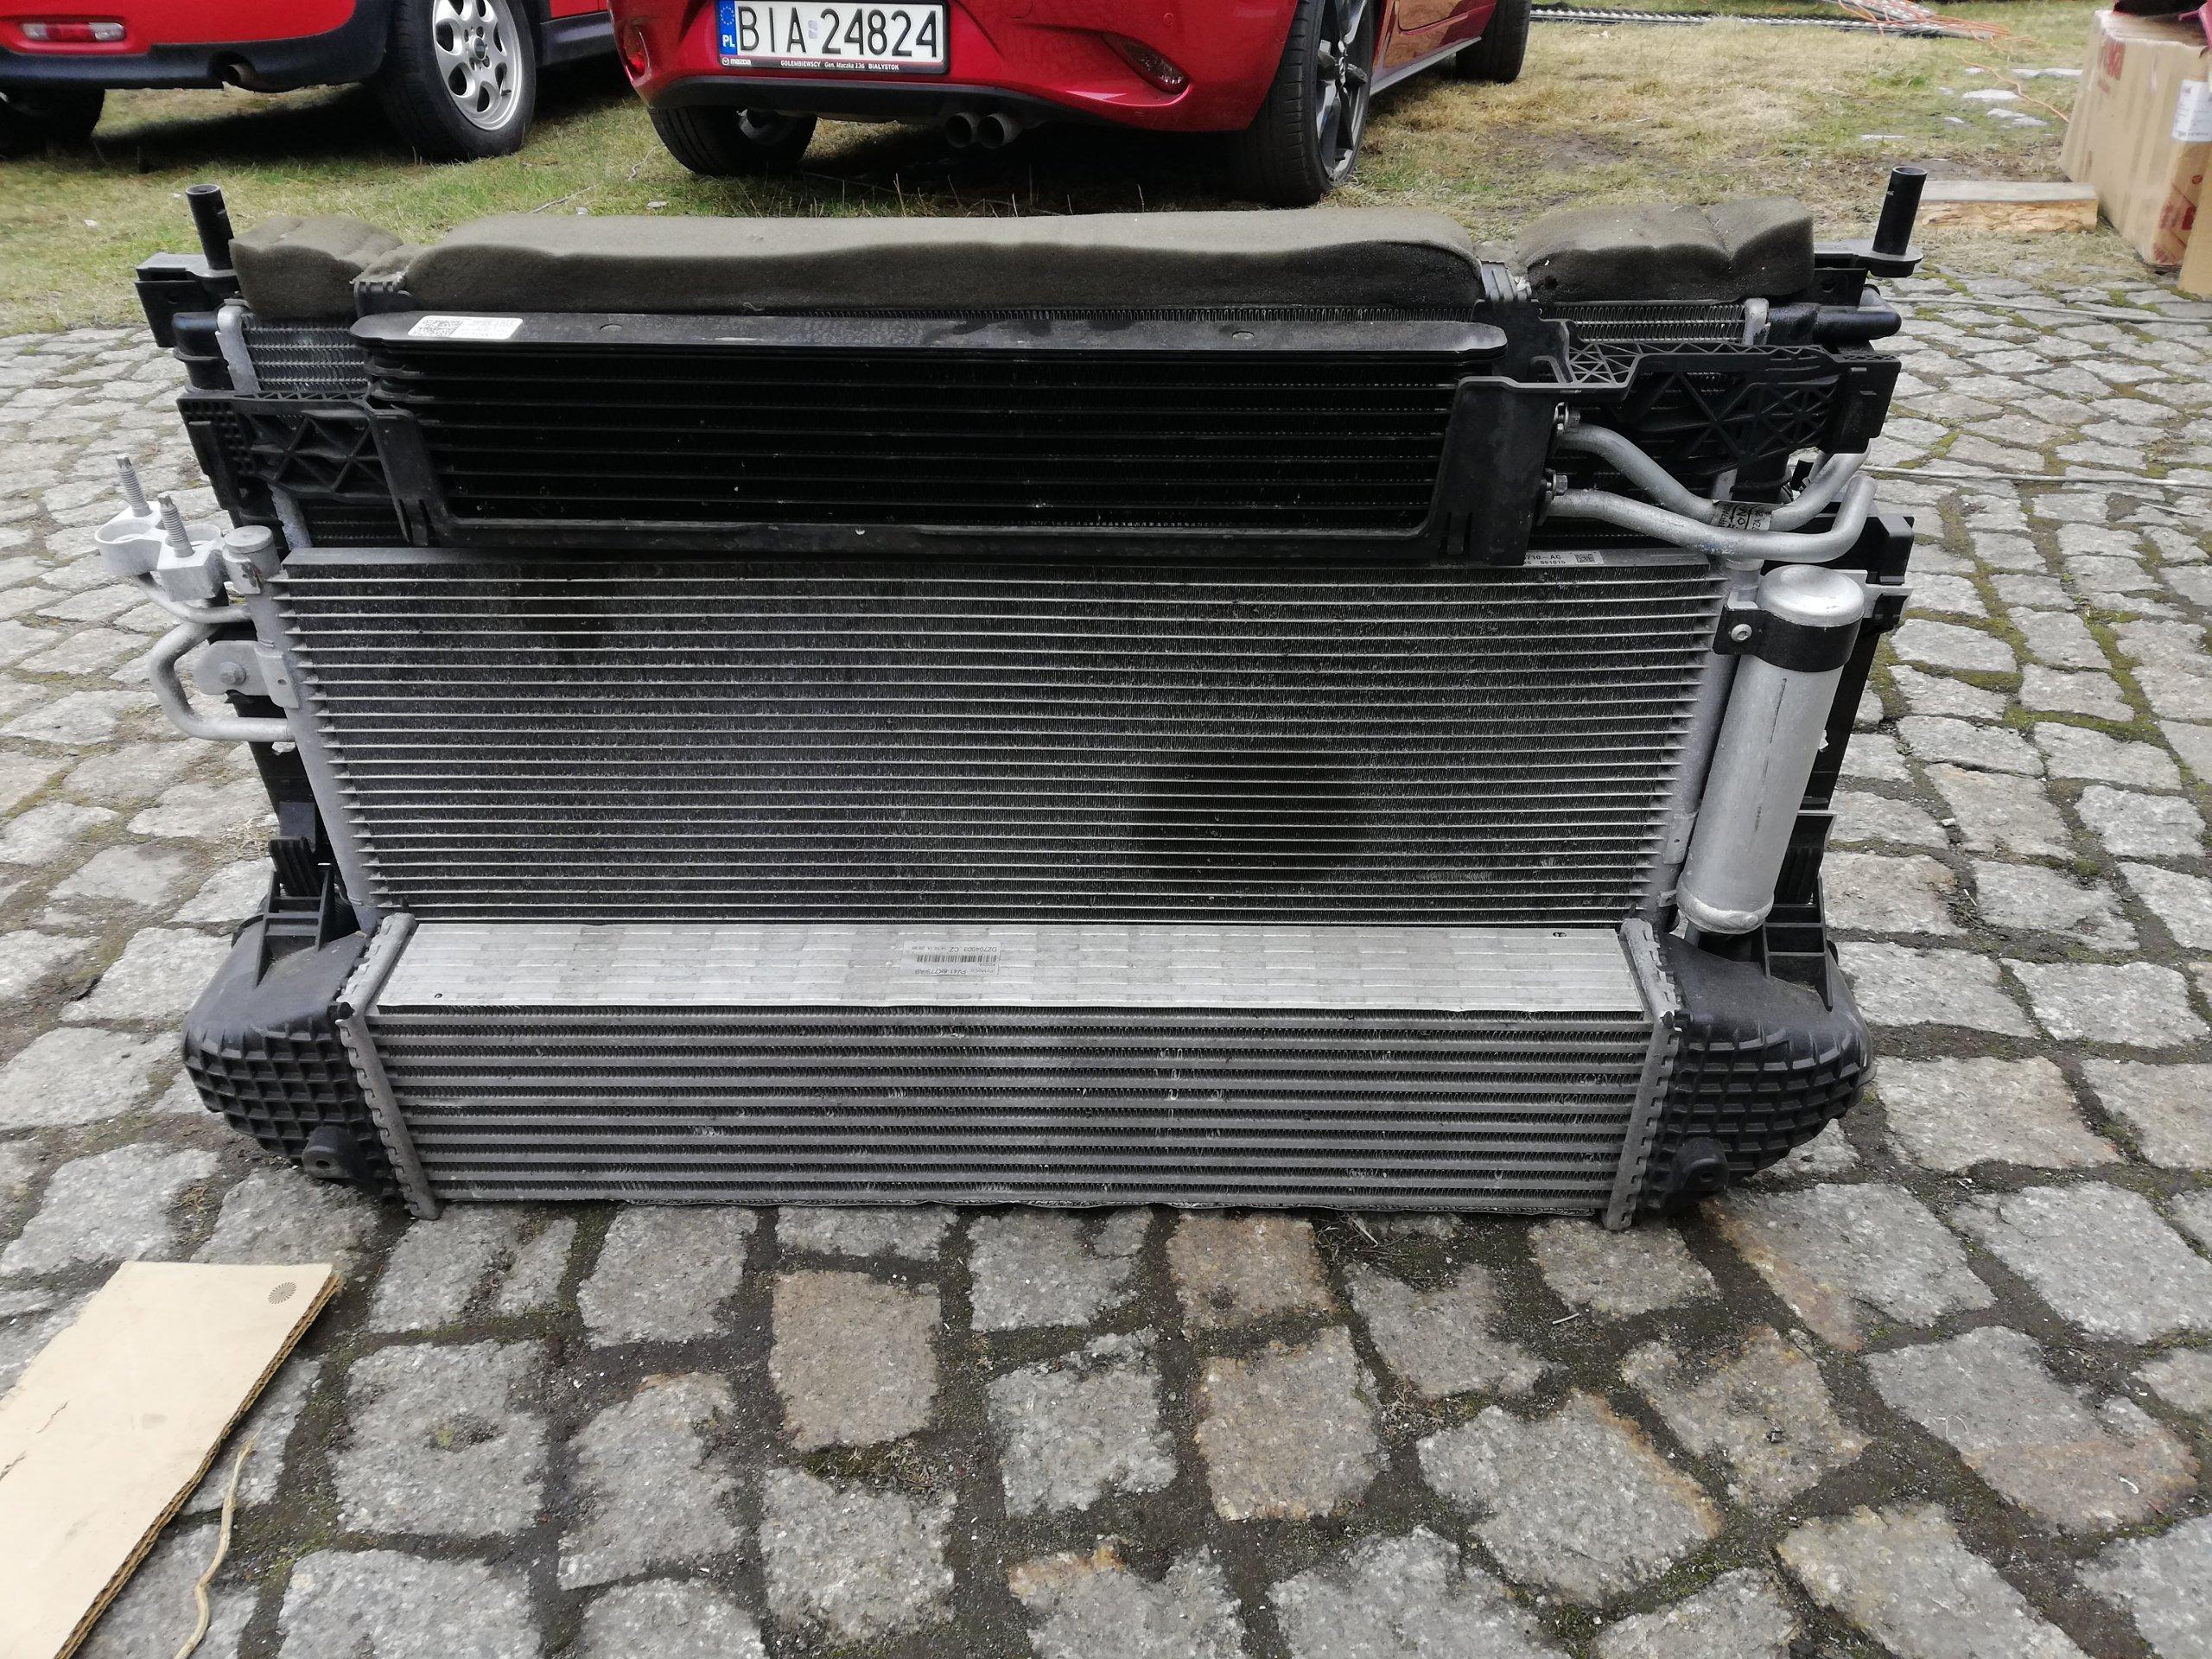 S-MAX 1.6 1.8 2.0 2.2 MANUAL AUTO RADIATOR FORD C-MAX MK2//GRAND C-MAX KUGA